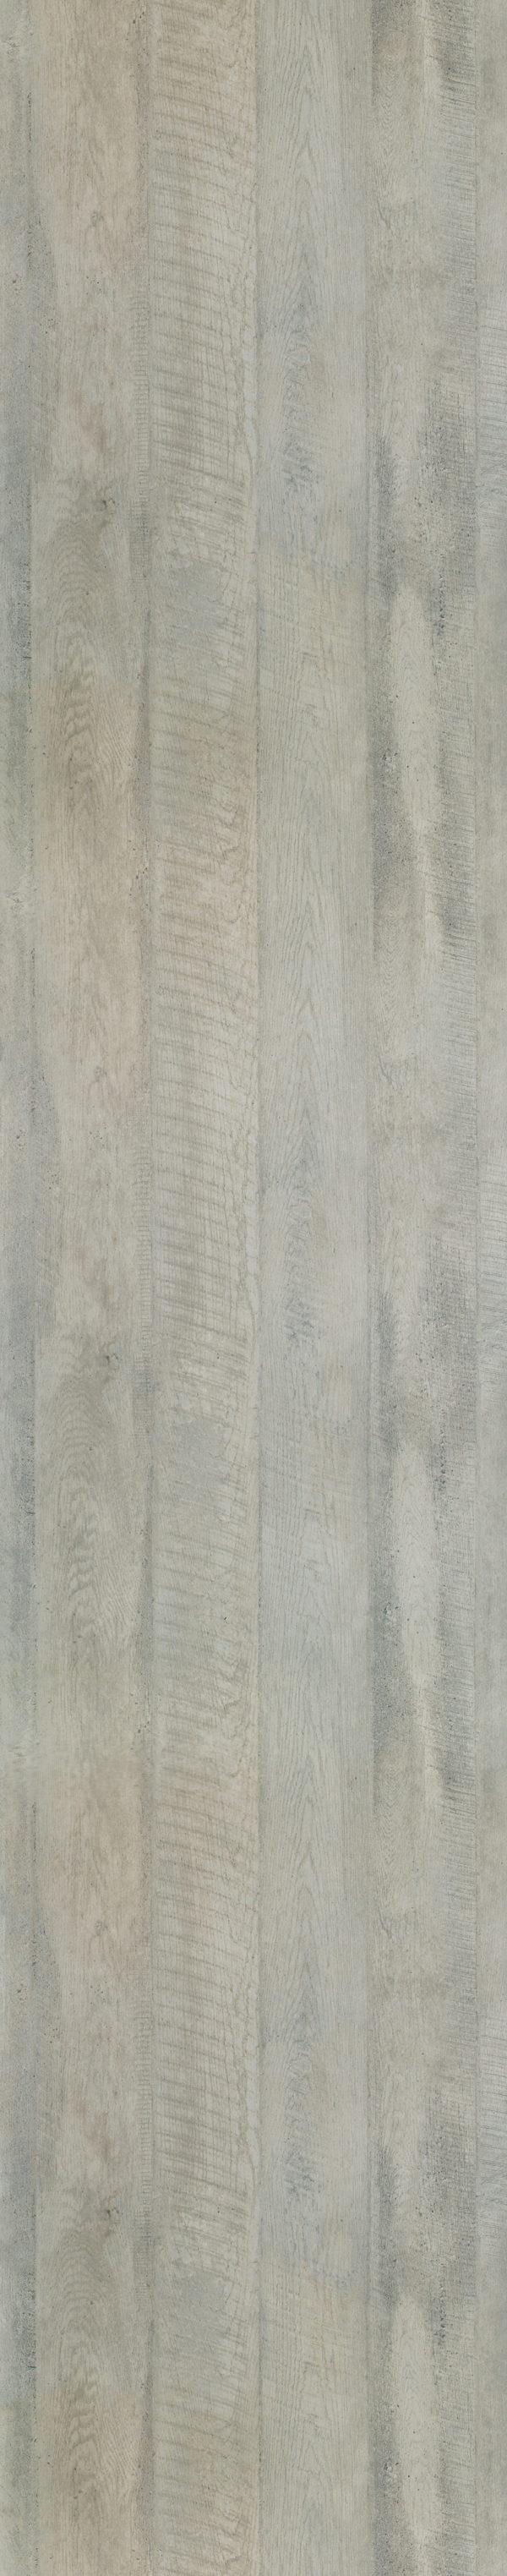 Axiom Authentic Formwood Full Length